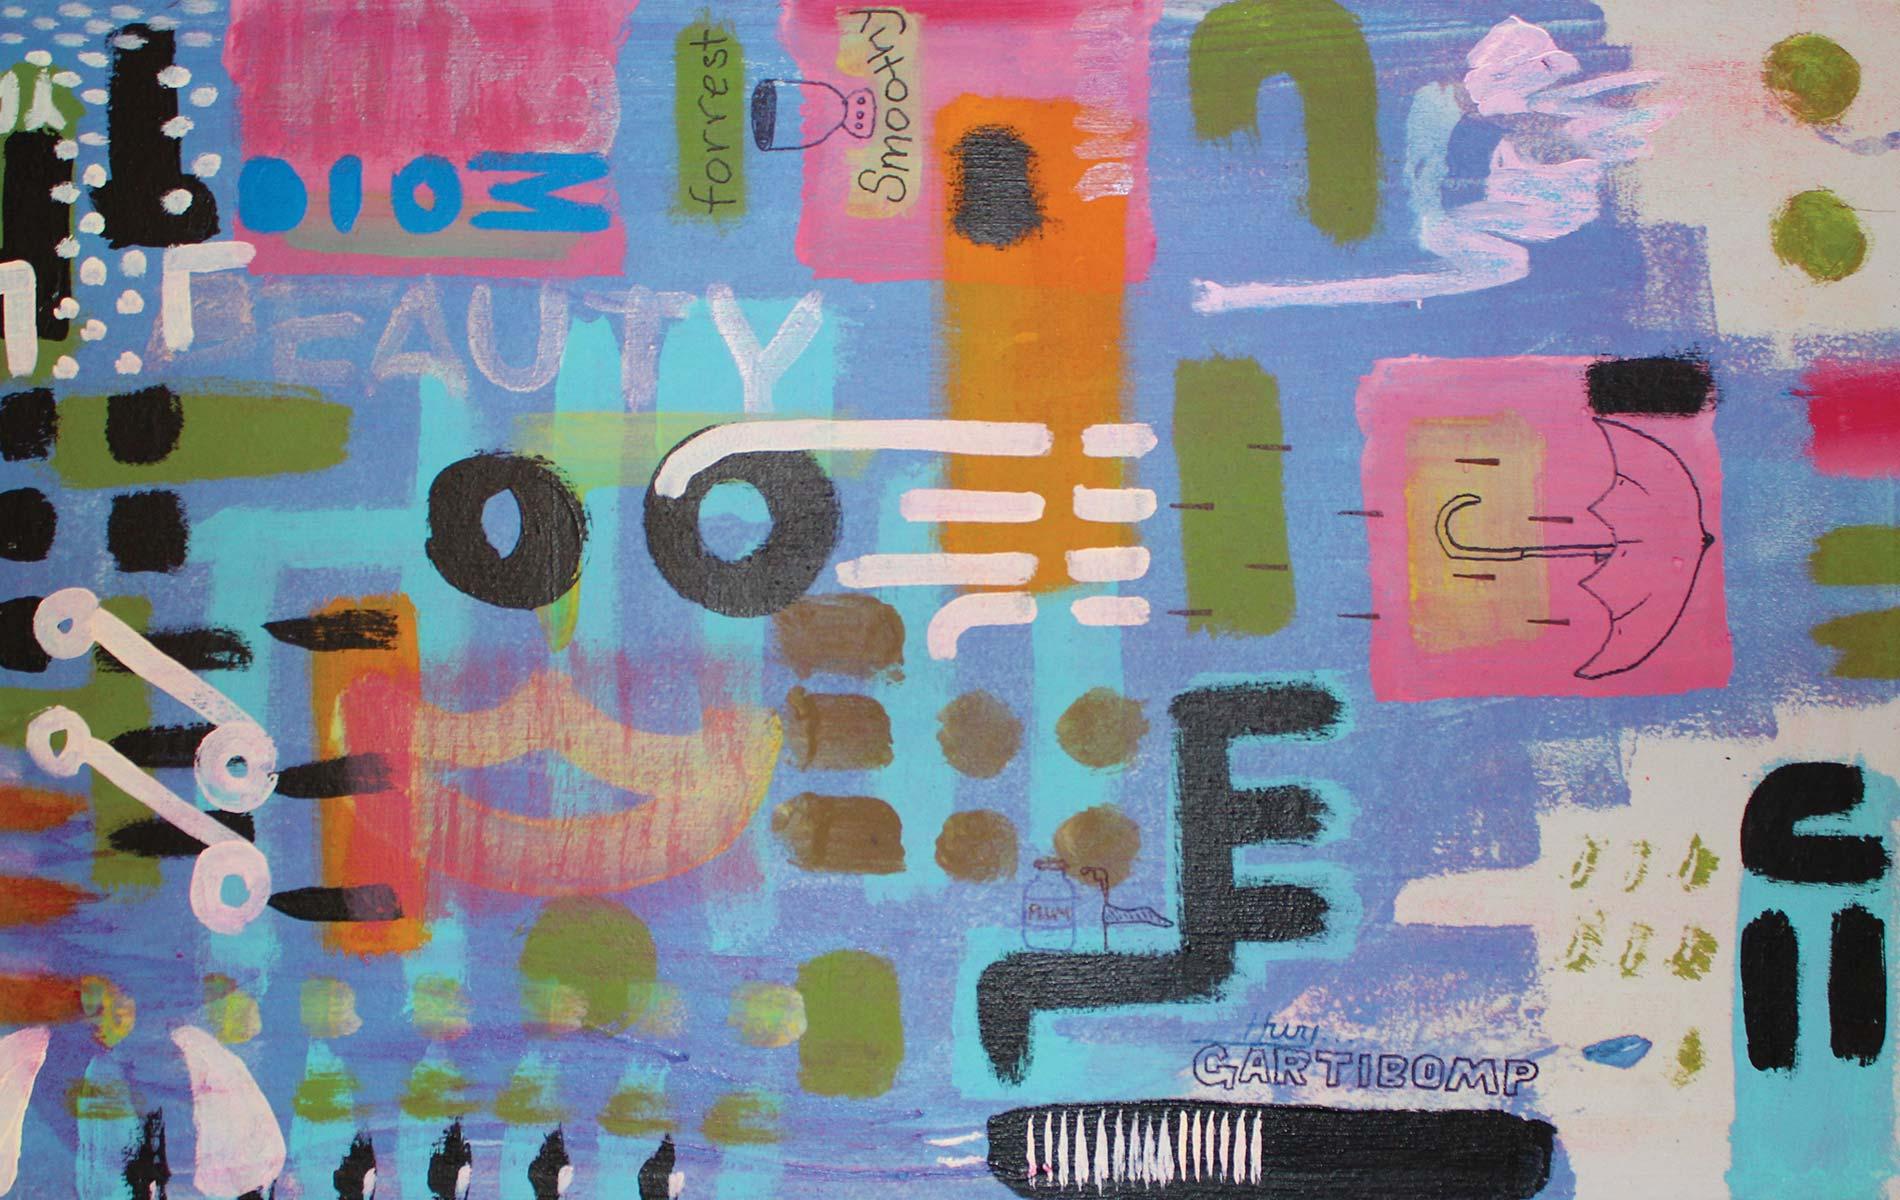 vie-magazine-art-walk-la-2012-feature